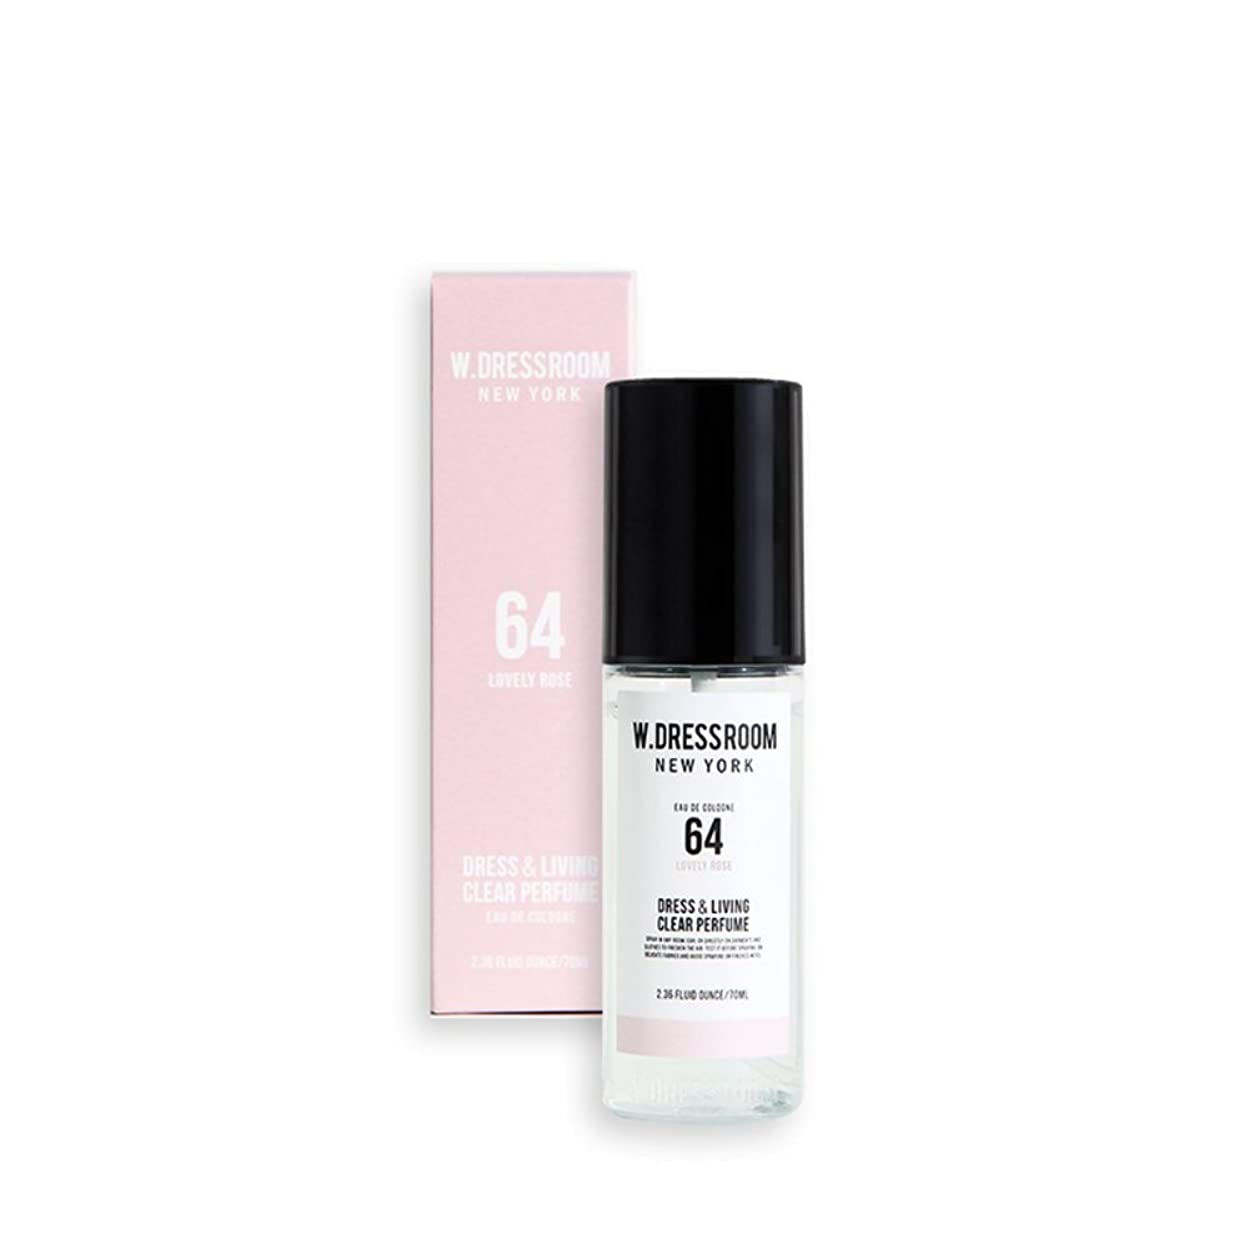 W.DRESSROOM Dress & Living Clear Perfume fragrance 70ml (#No.64 Lovely Rose)/ダブルドレスルーム ドレス&リビング クリア パフューム 70ml (#No.64 Lovely Rose)